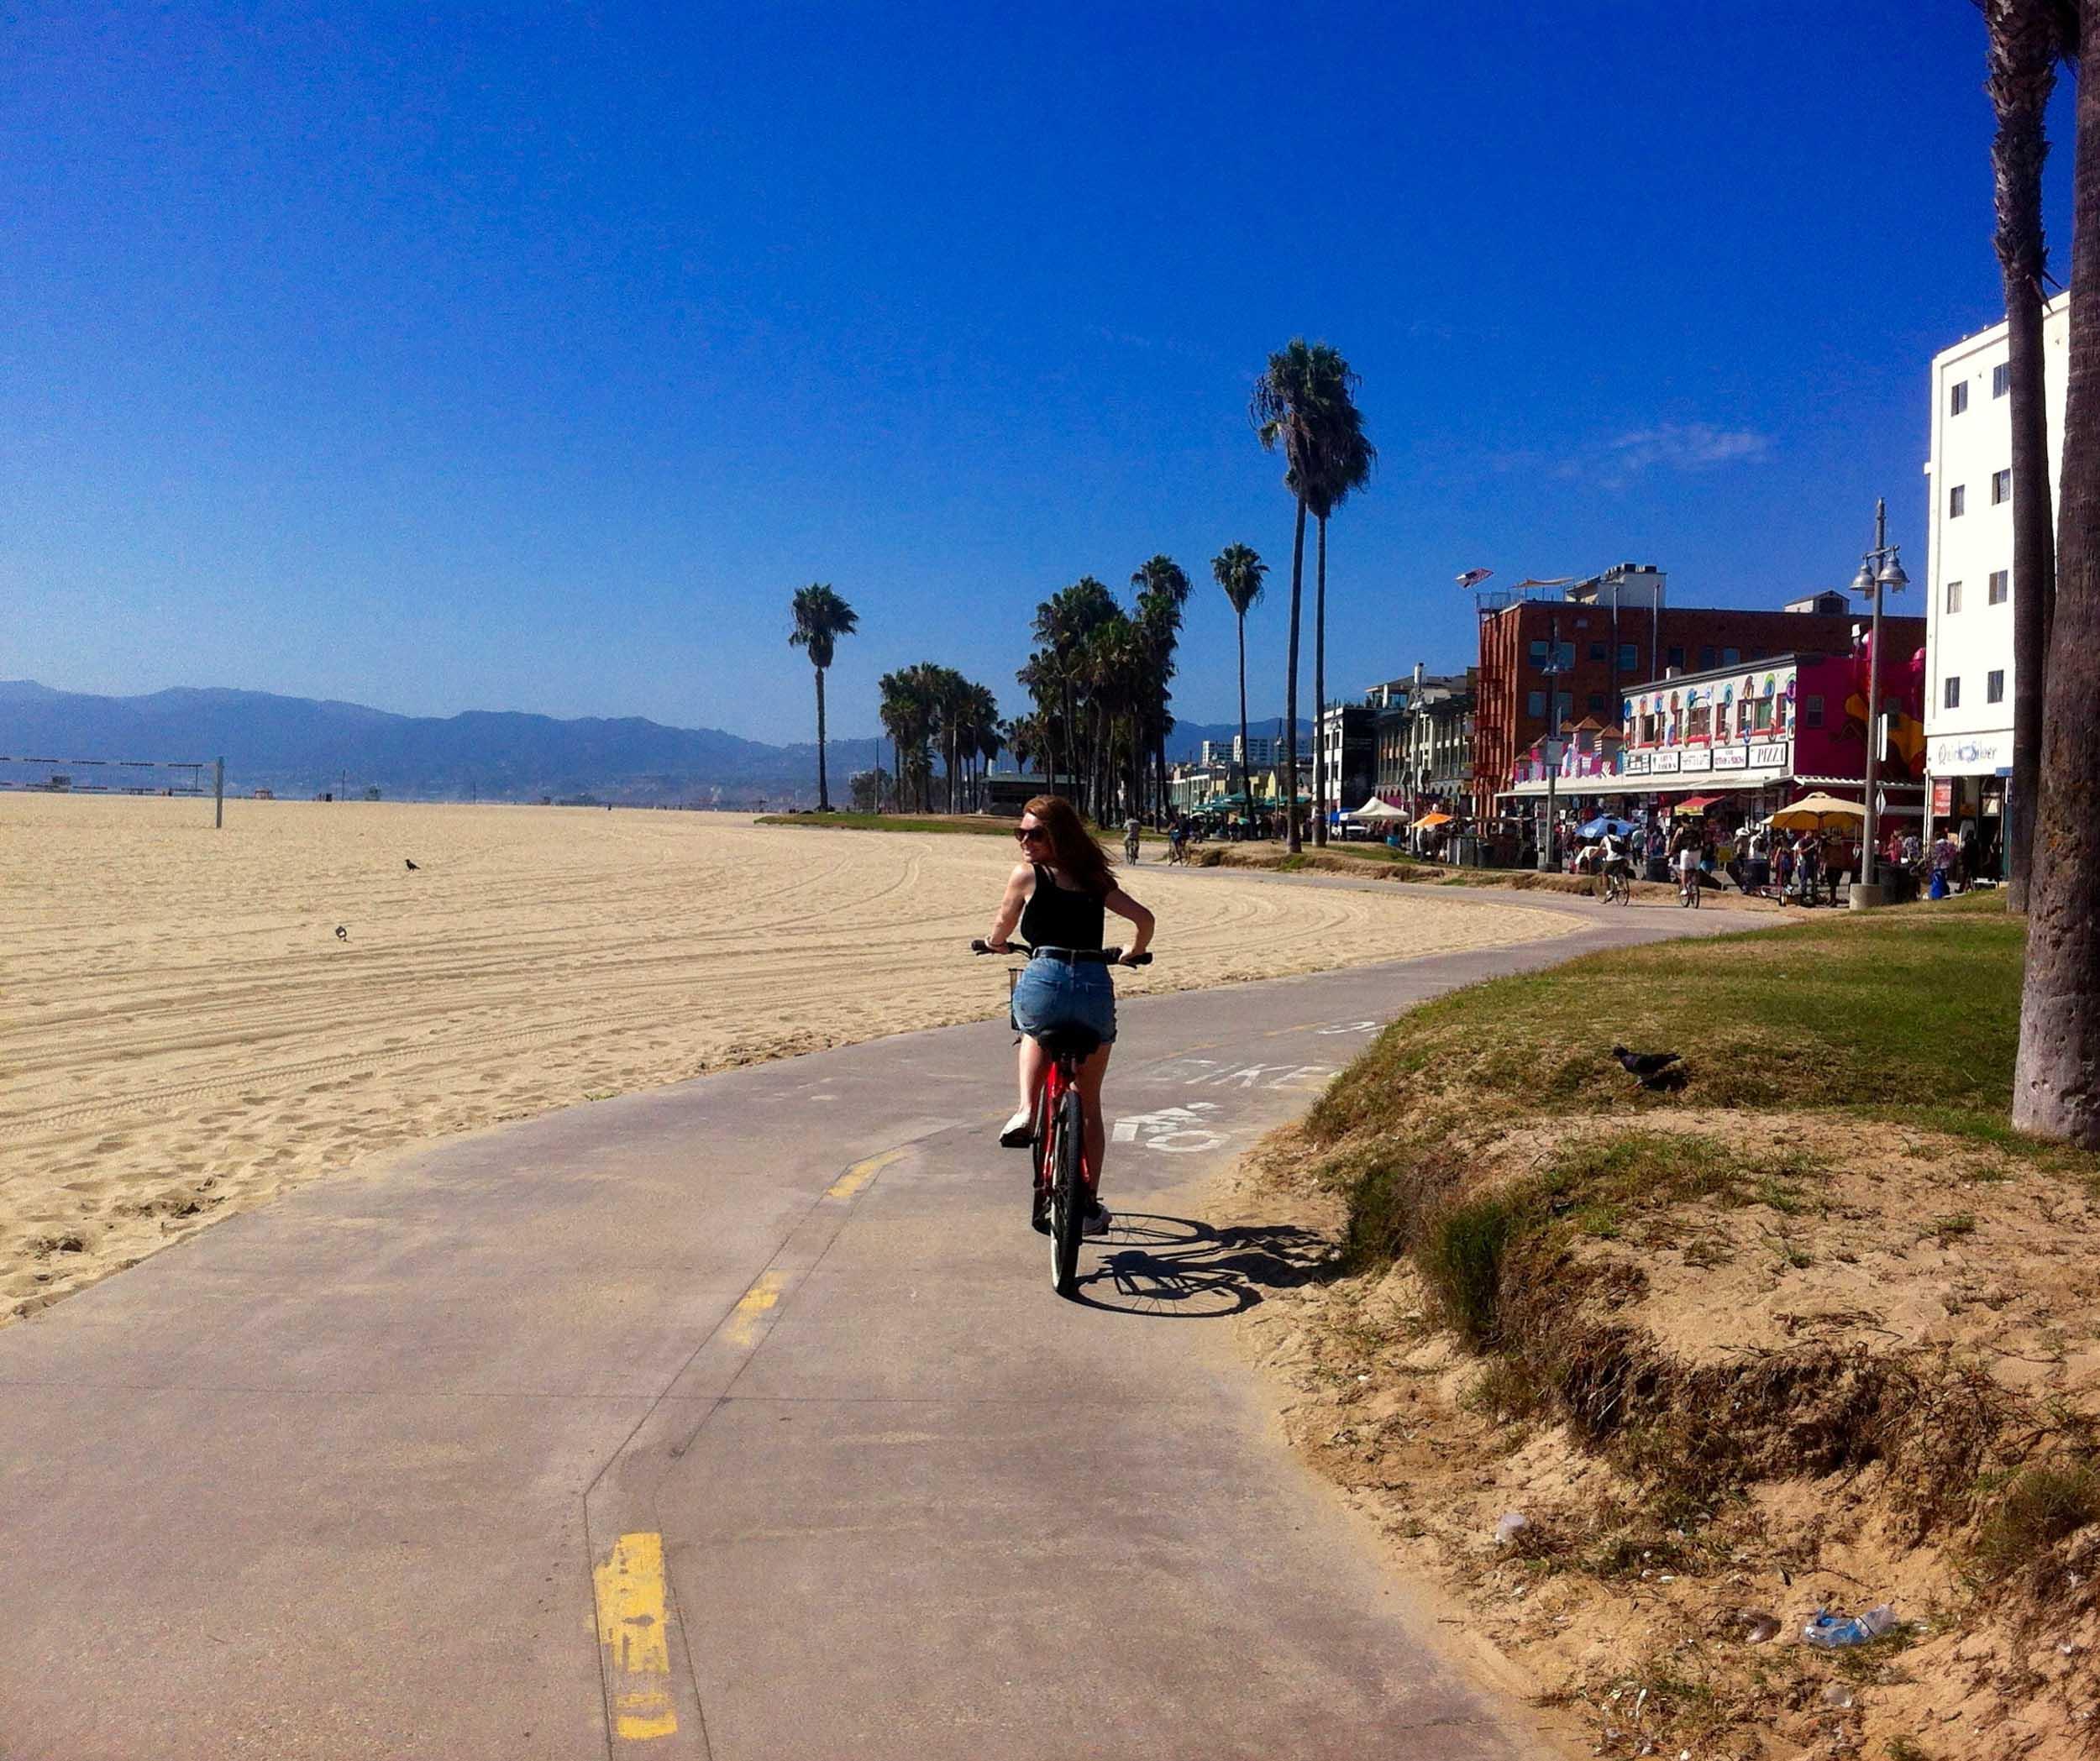 Woman cycling the bike path alongside the beach in Santa Monica, California, USA.